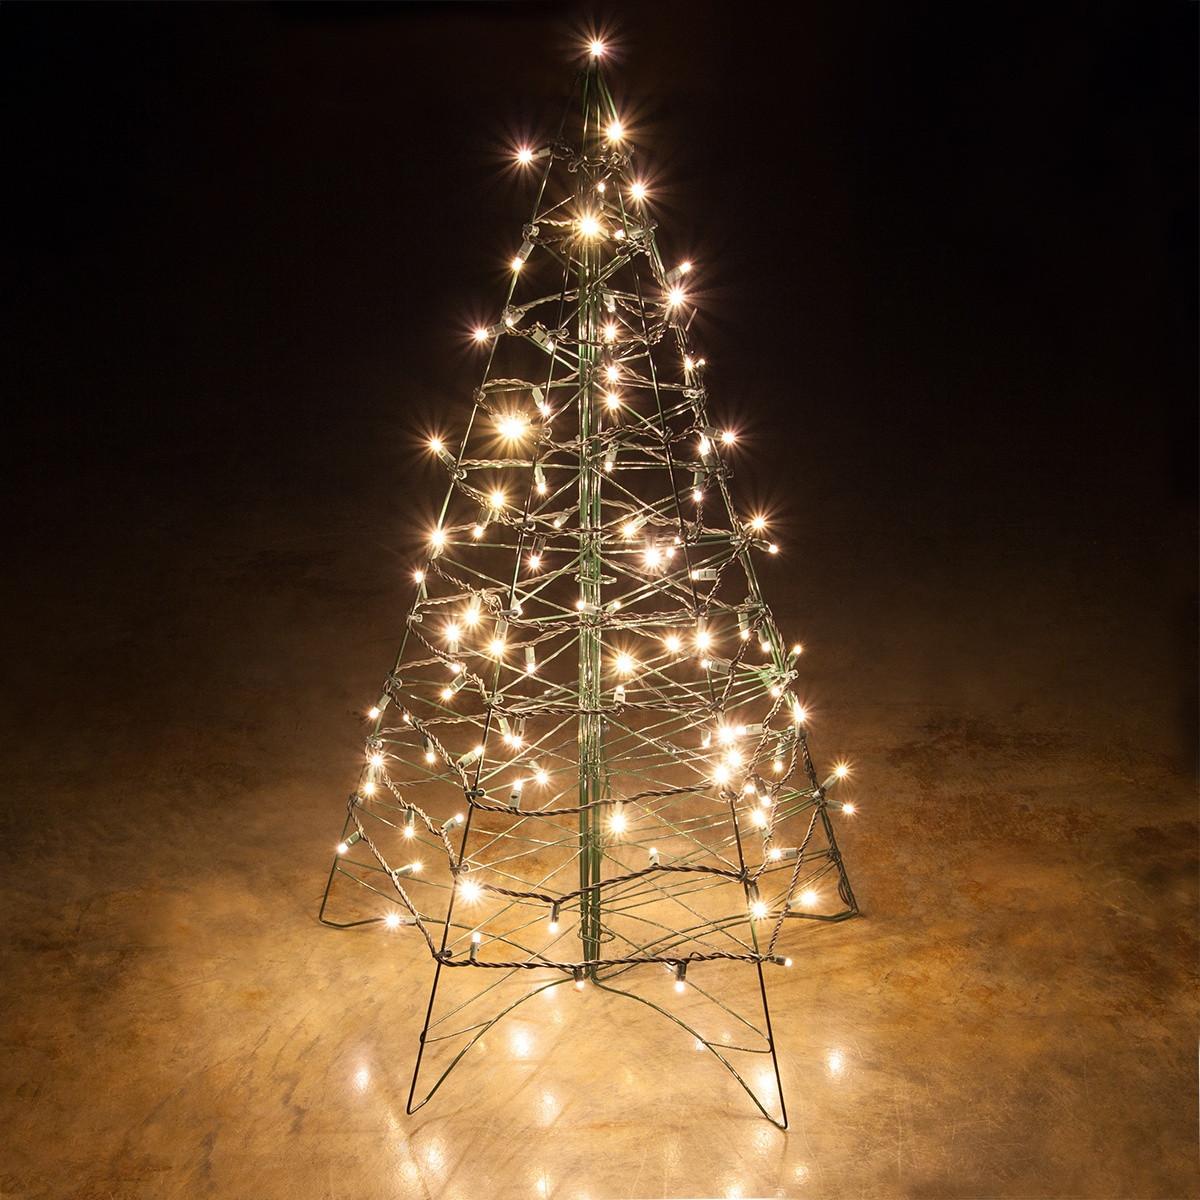 Outdoor Light Up Christmas Tree  Lighted Warm White LED Outdoor Christmas Tree